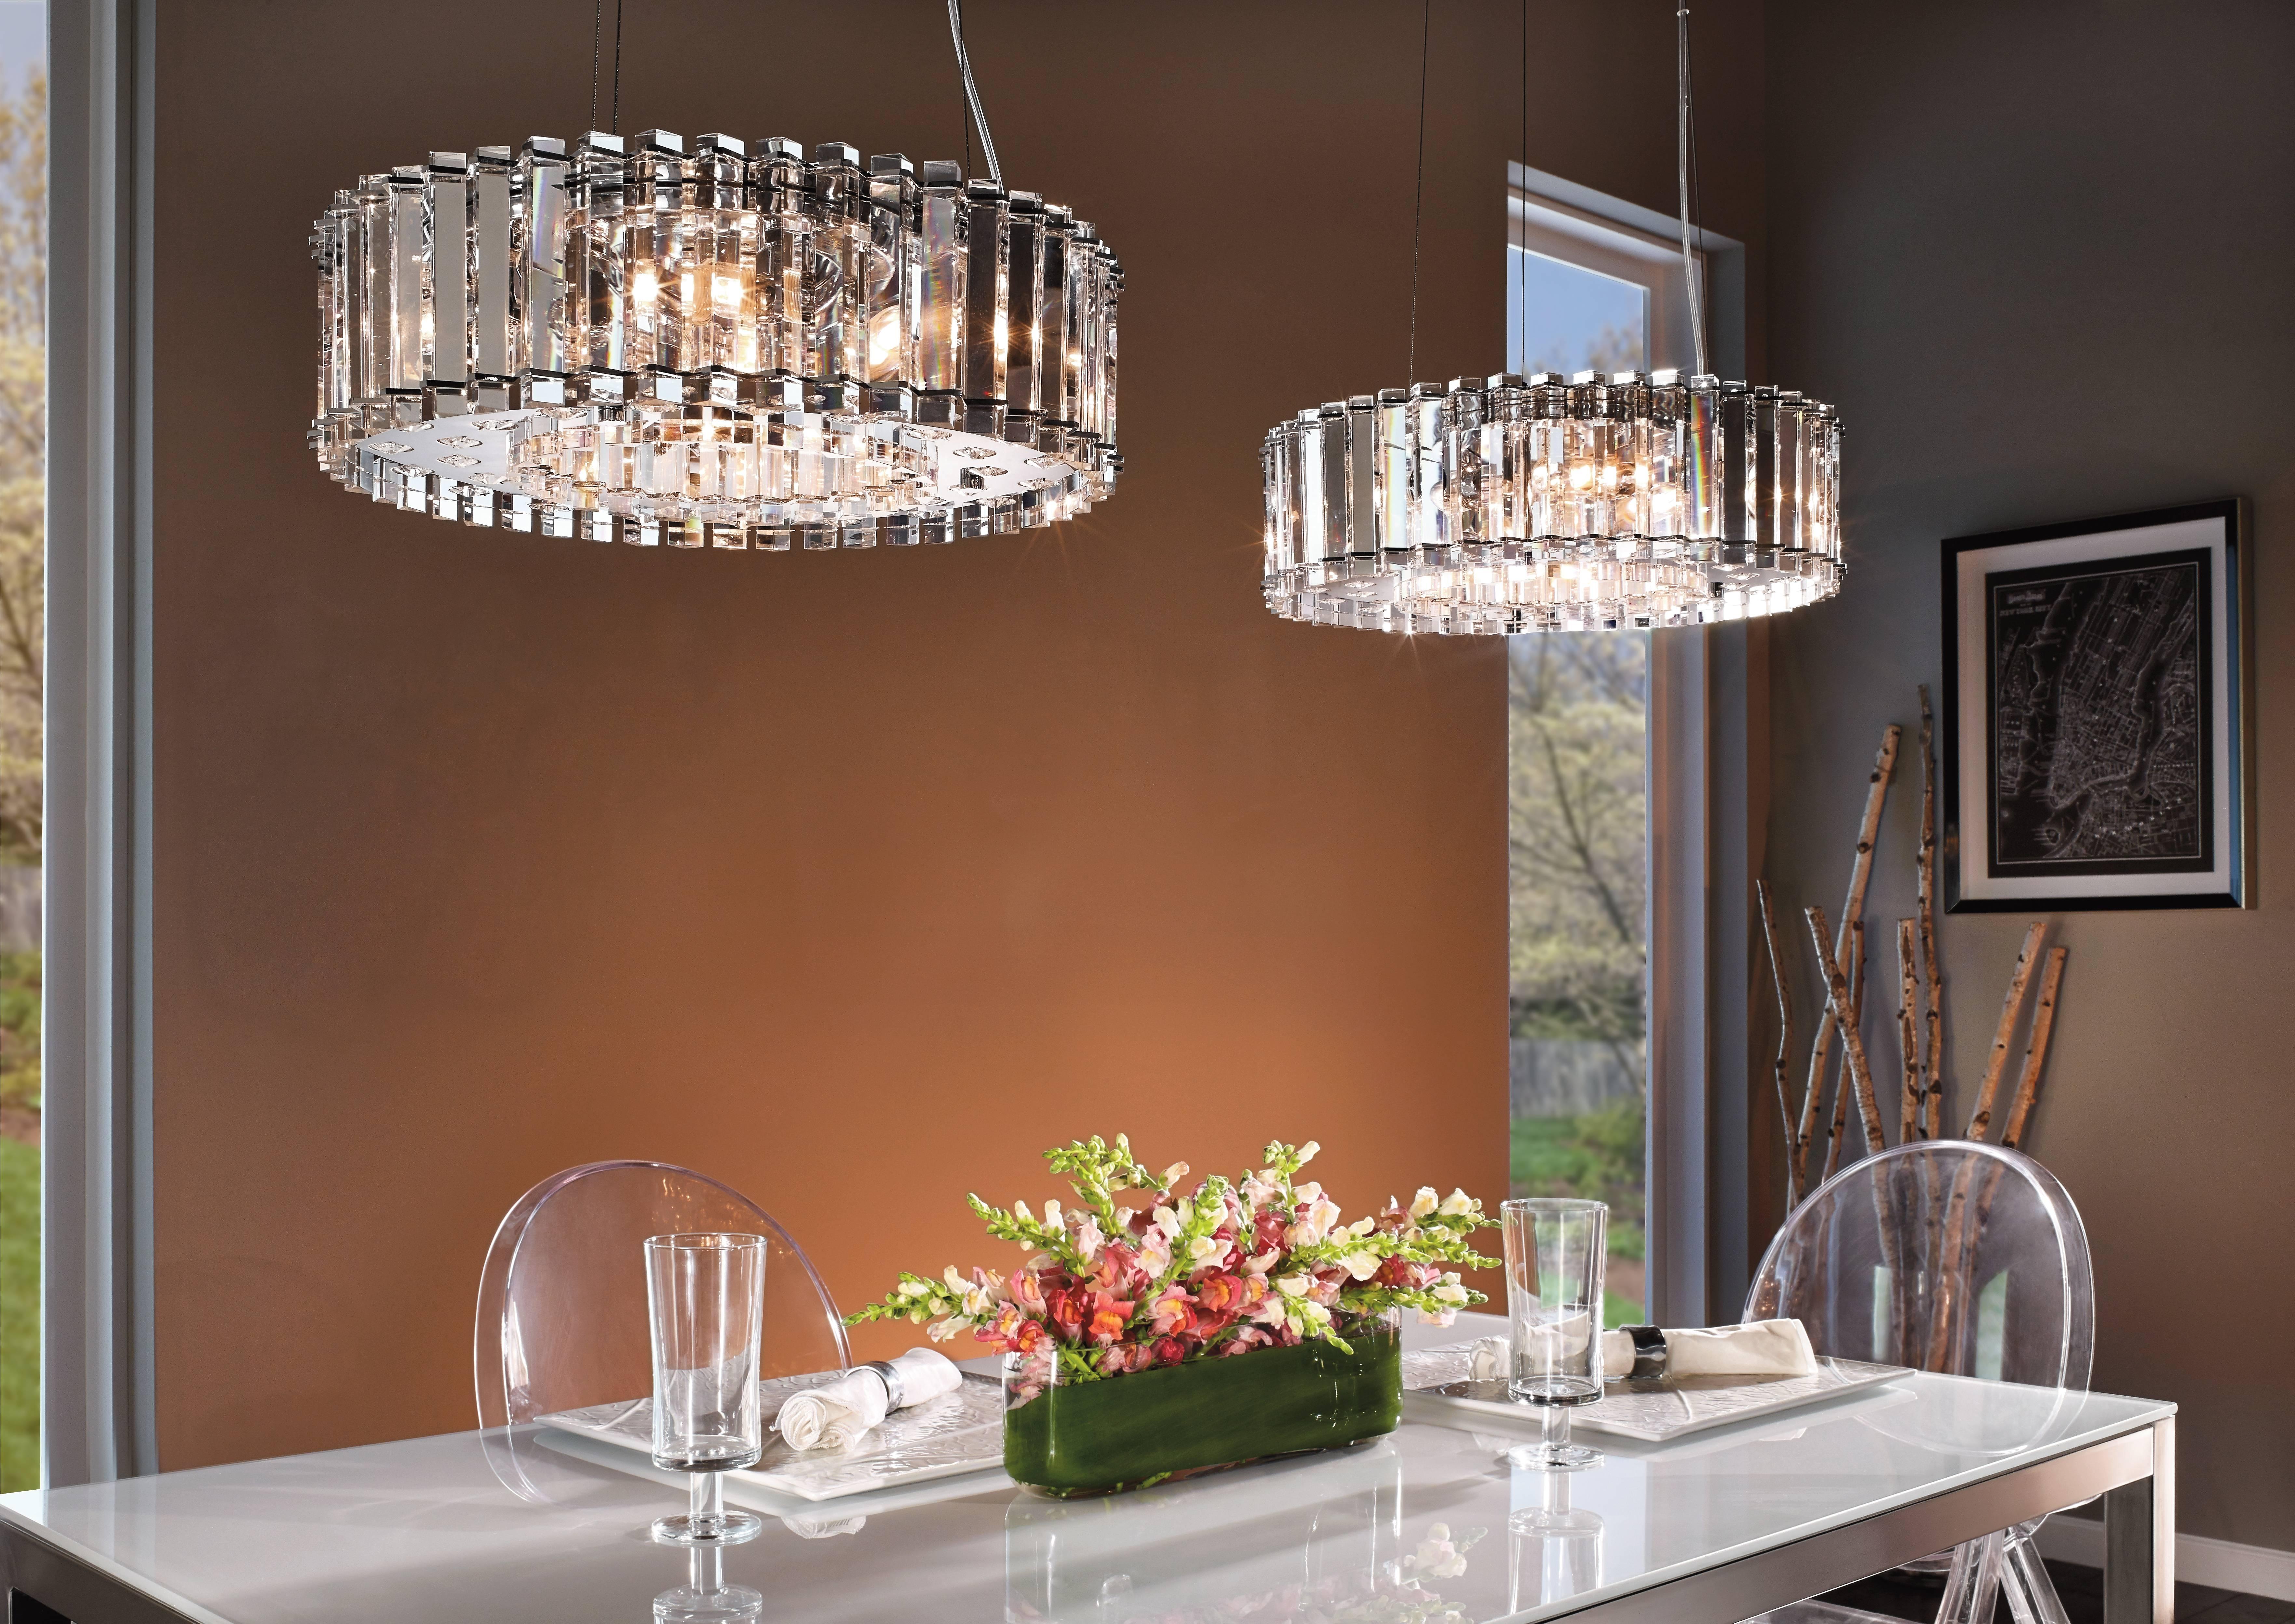 5 Tips For Perfect Dining Room Lighting   Lando Lighting Regarding Pendant Lighting With Matching Chandeliers (Photo 13 of 15)